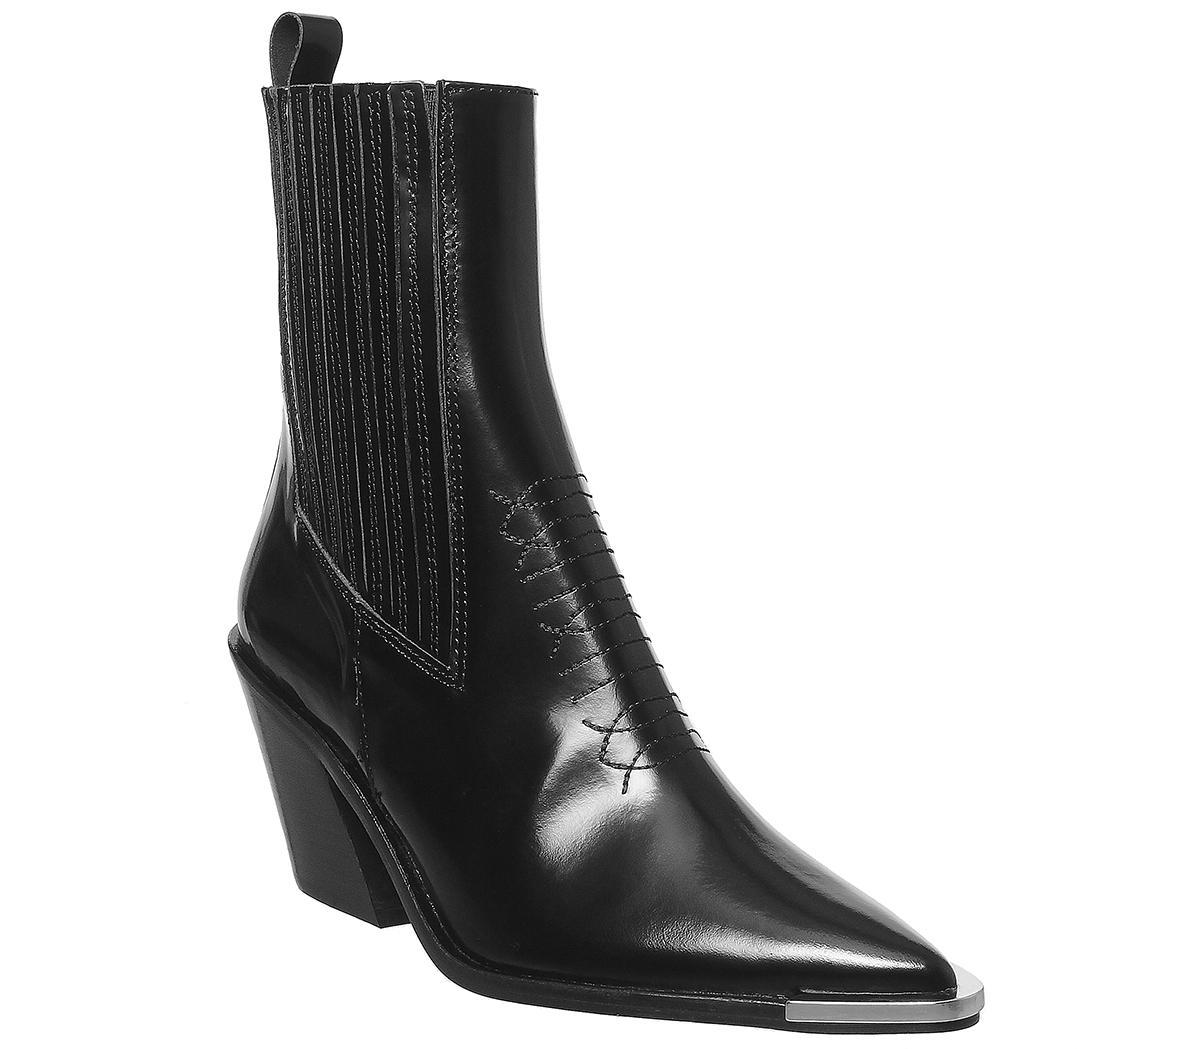 Office Arabella High Cut Western Boots Black Box Leather